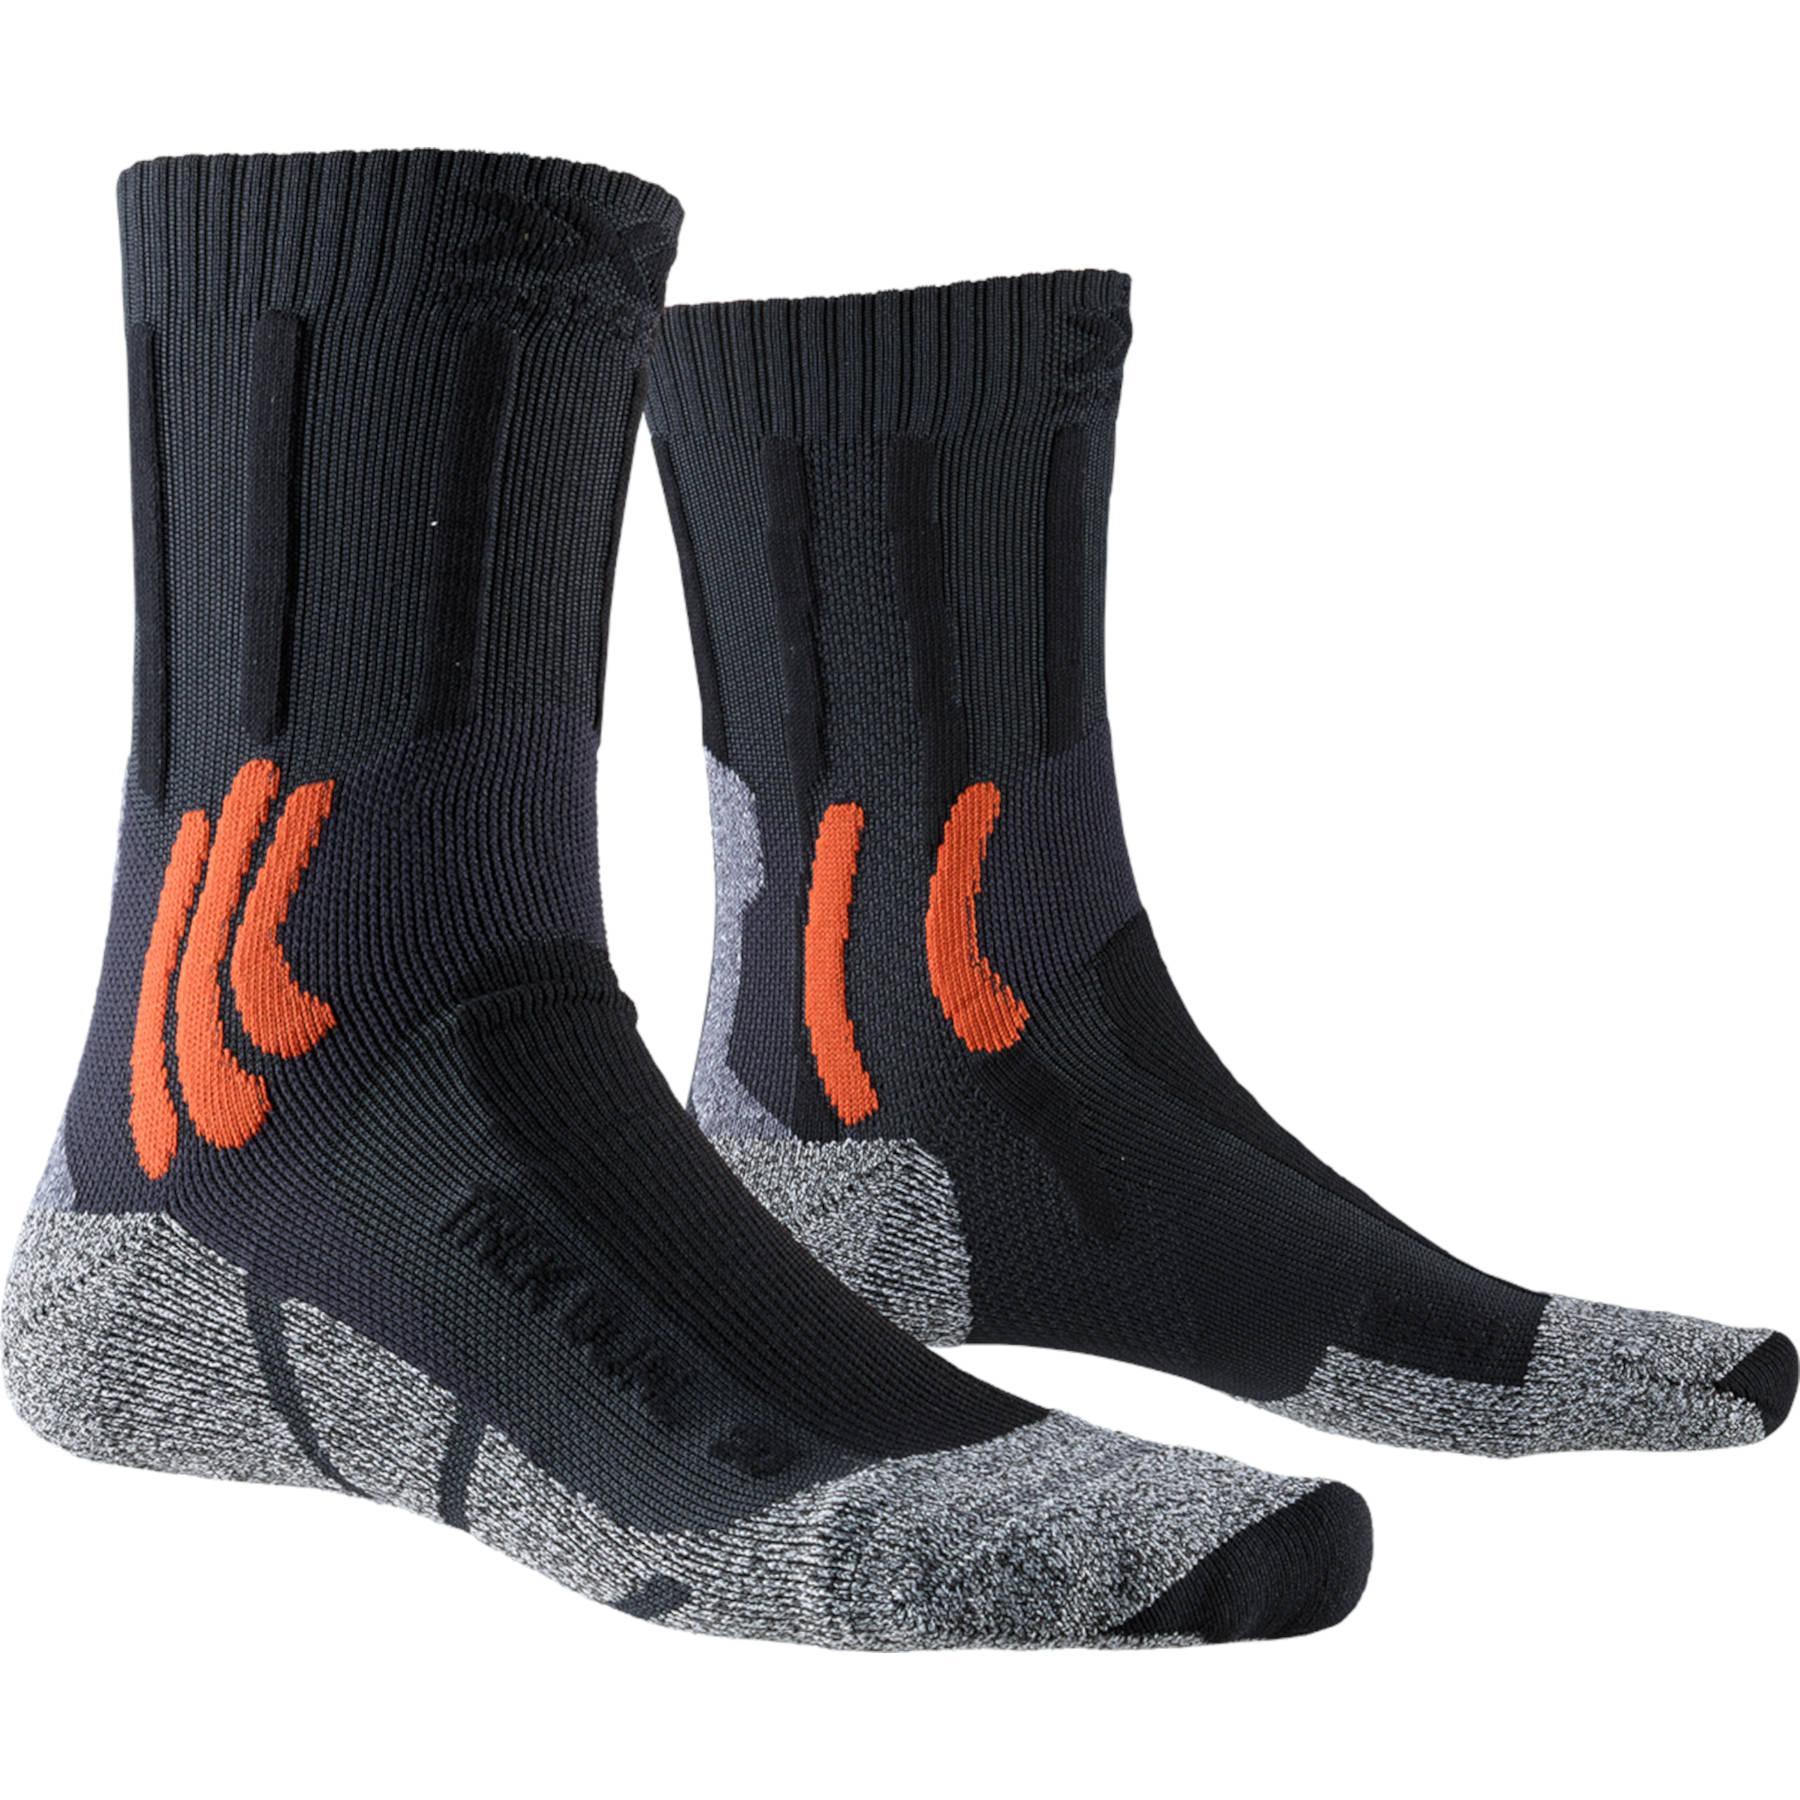 X-Socks Dual Trek Unisex Socken - granite grey/bonfire orange